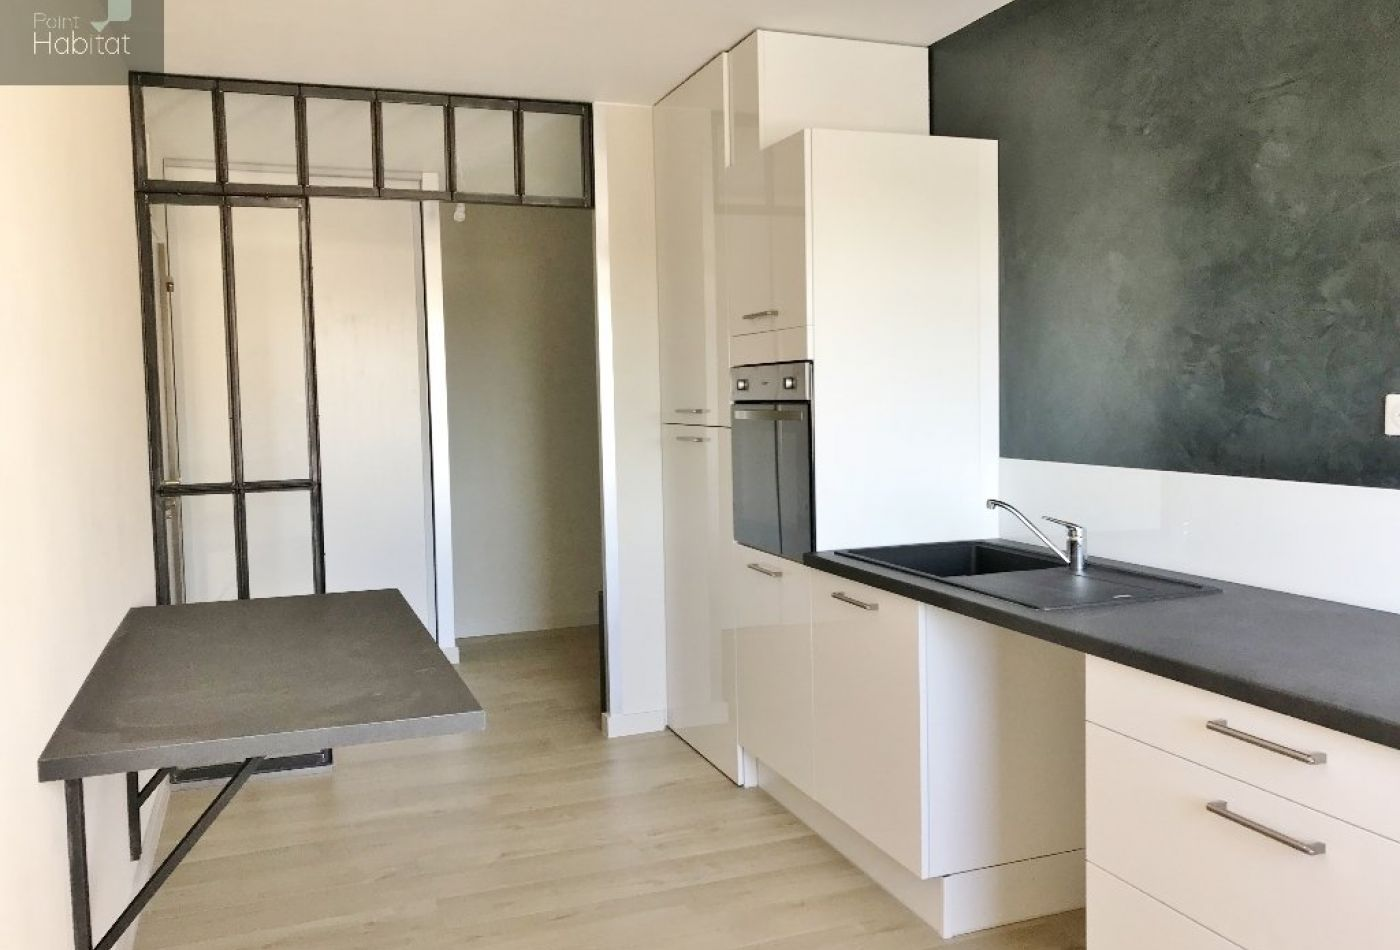 vente appartement rodez 104m 4 pi ces 164 000. Black Bedroom Furniture Sets. Home Design Ideas